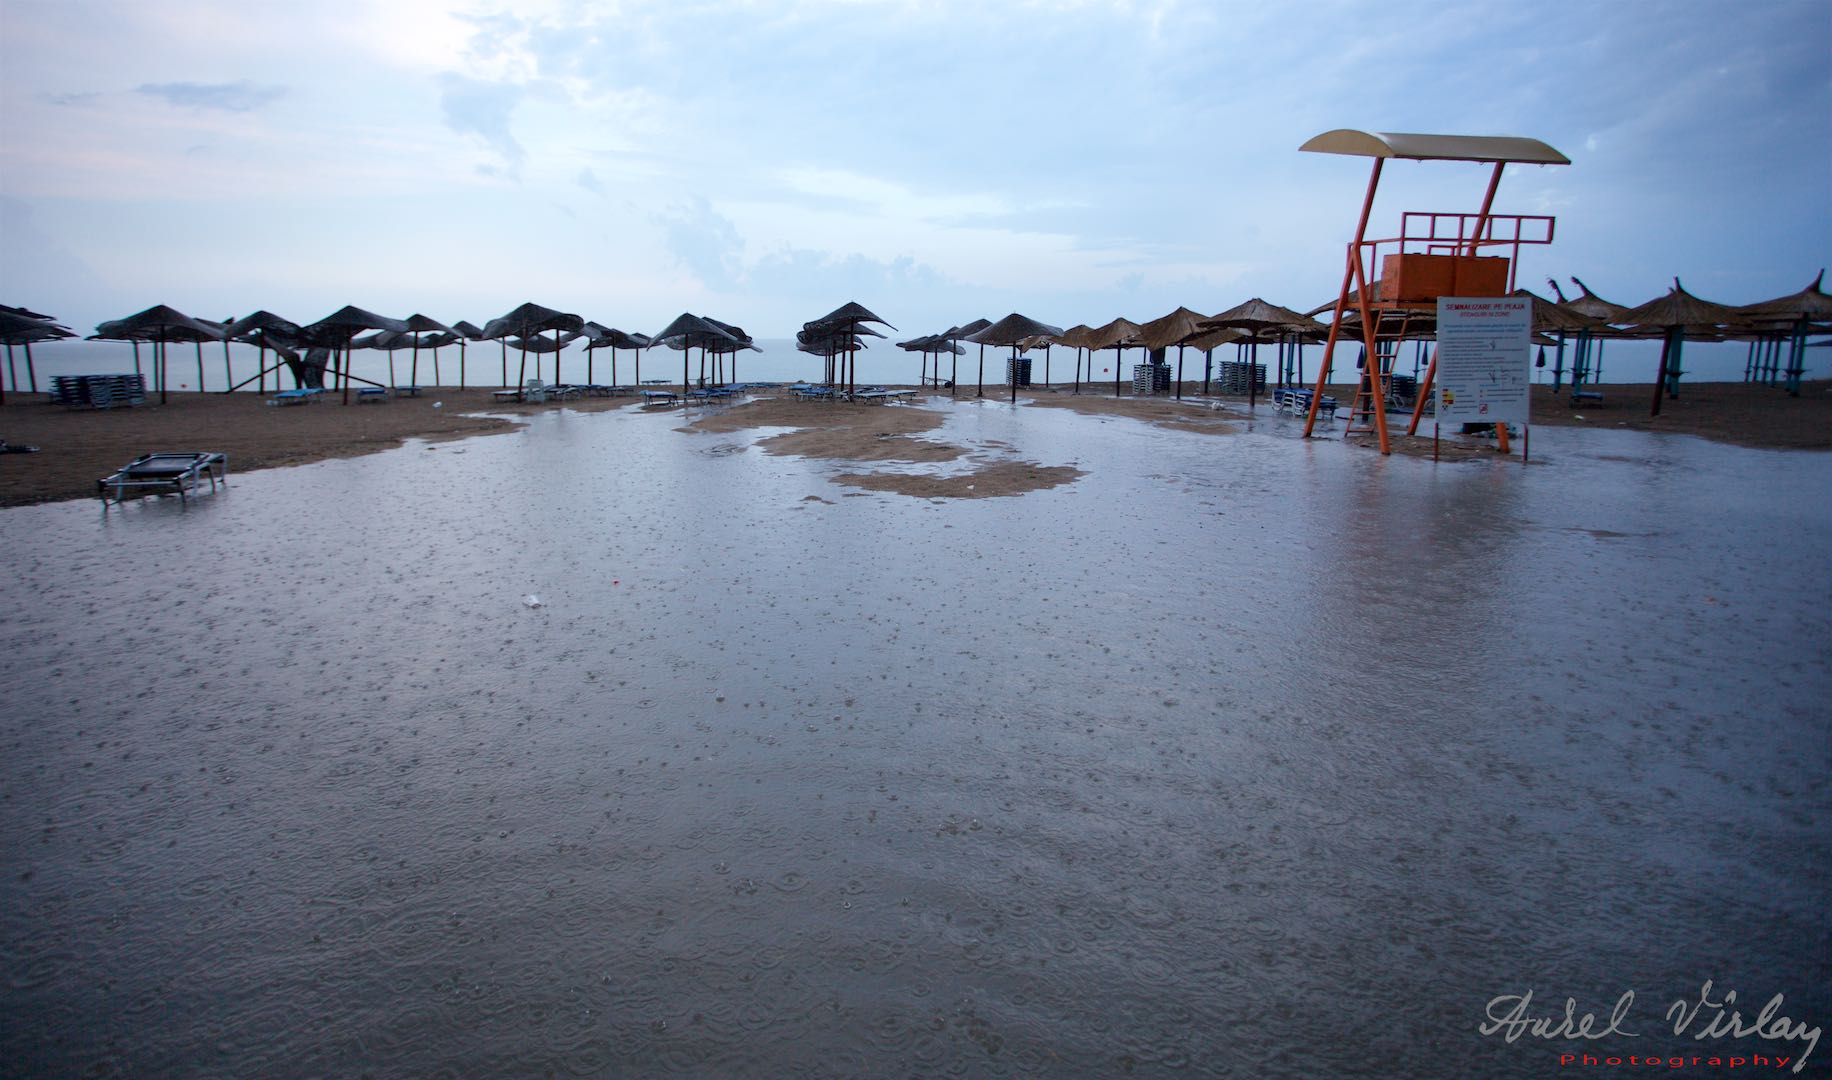 Water on the beach, Black Sea beyond the umbrellas. Just choose!